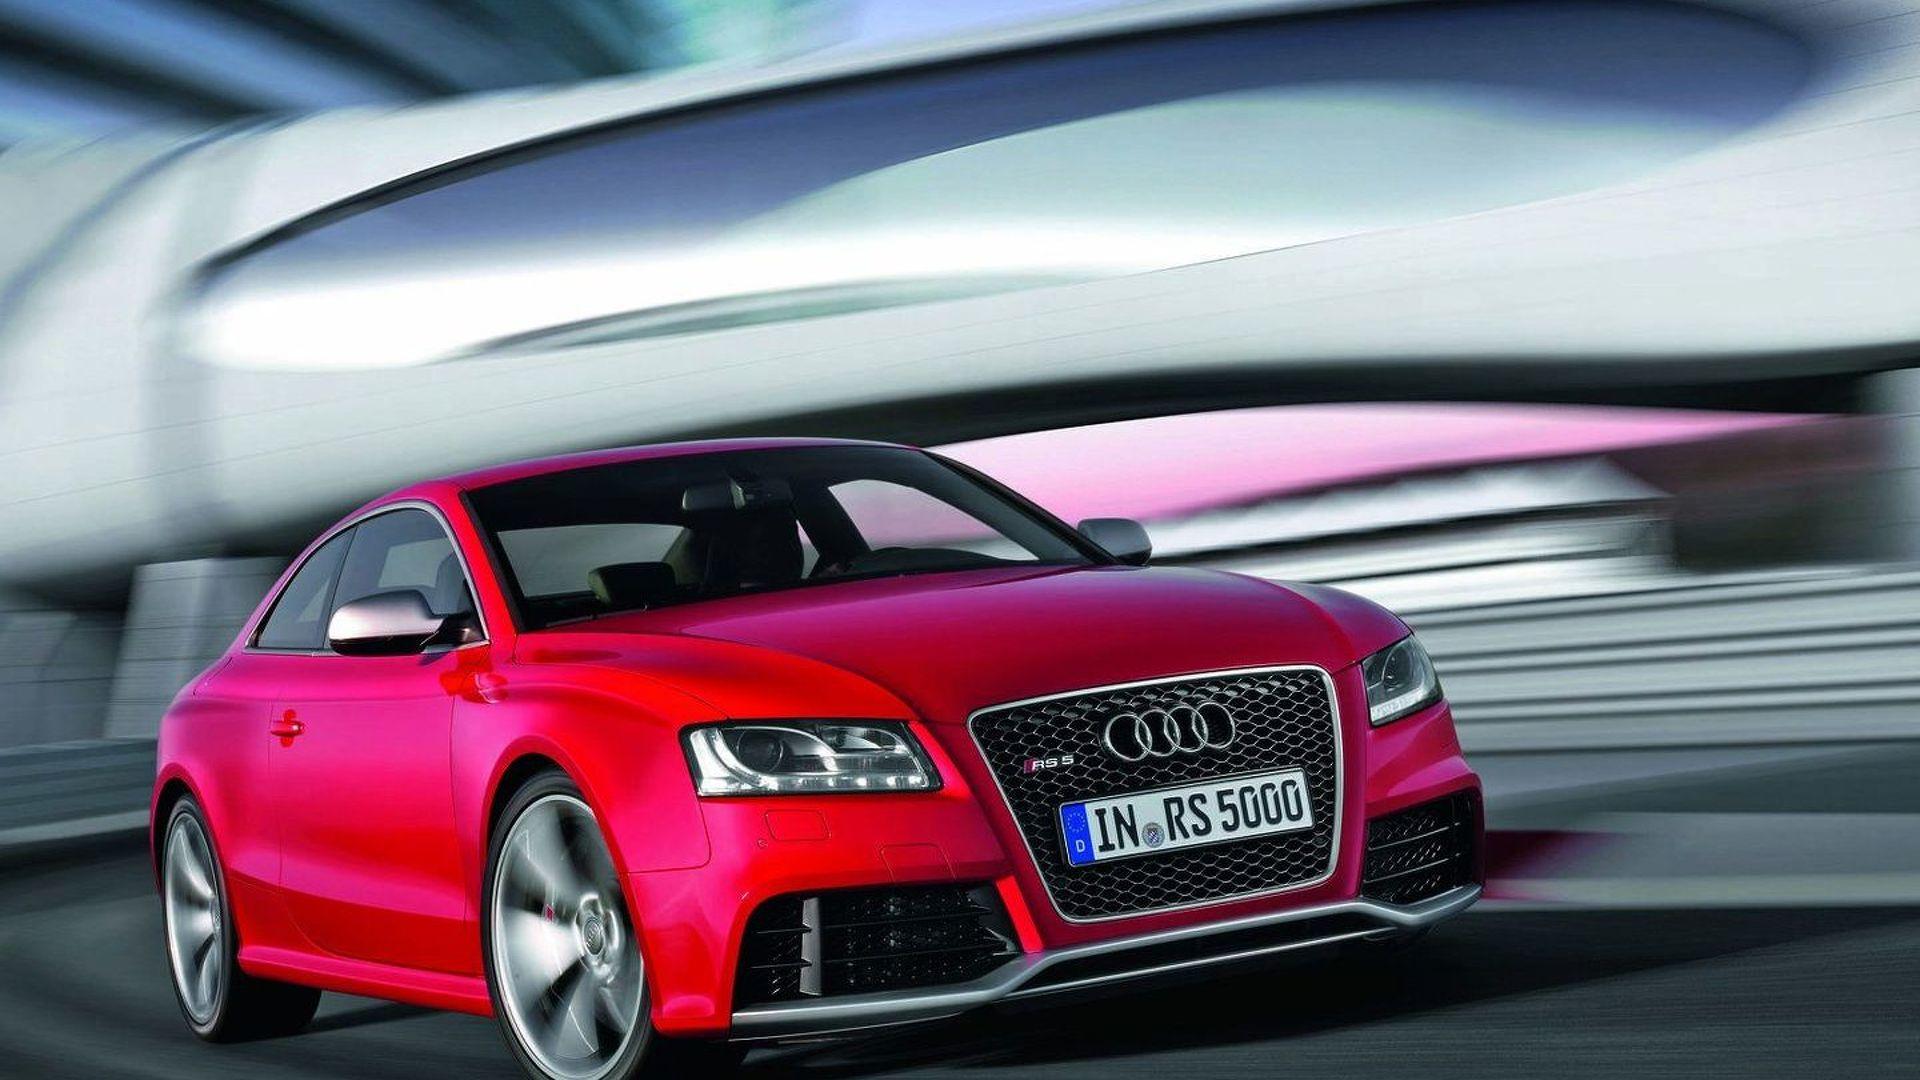 Audi RS5 Confirmed for U.S. - rumors